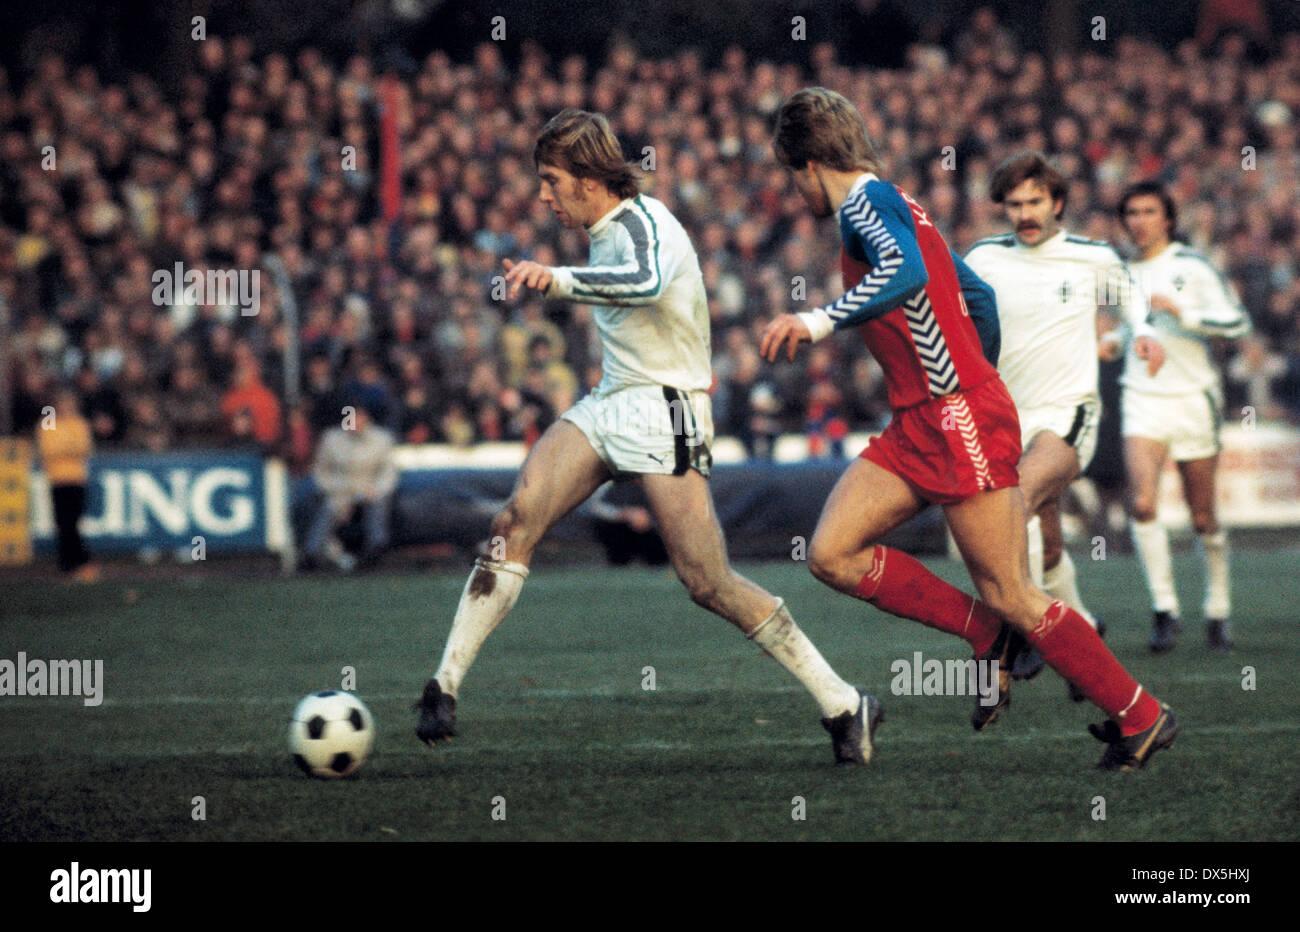 football, Bundesliga, 1975/1976, Grotenburg Stadium, FC Bayer 05 Uerdingen versus Borussia Moenchengladbach 1:1, scene of the match, Henning Jensen (MG) in ball possession - Stock Image